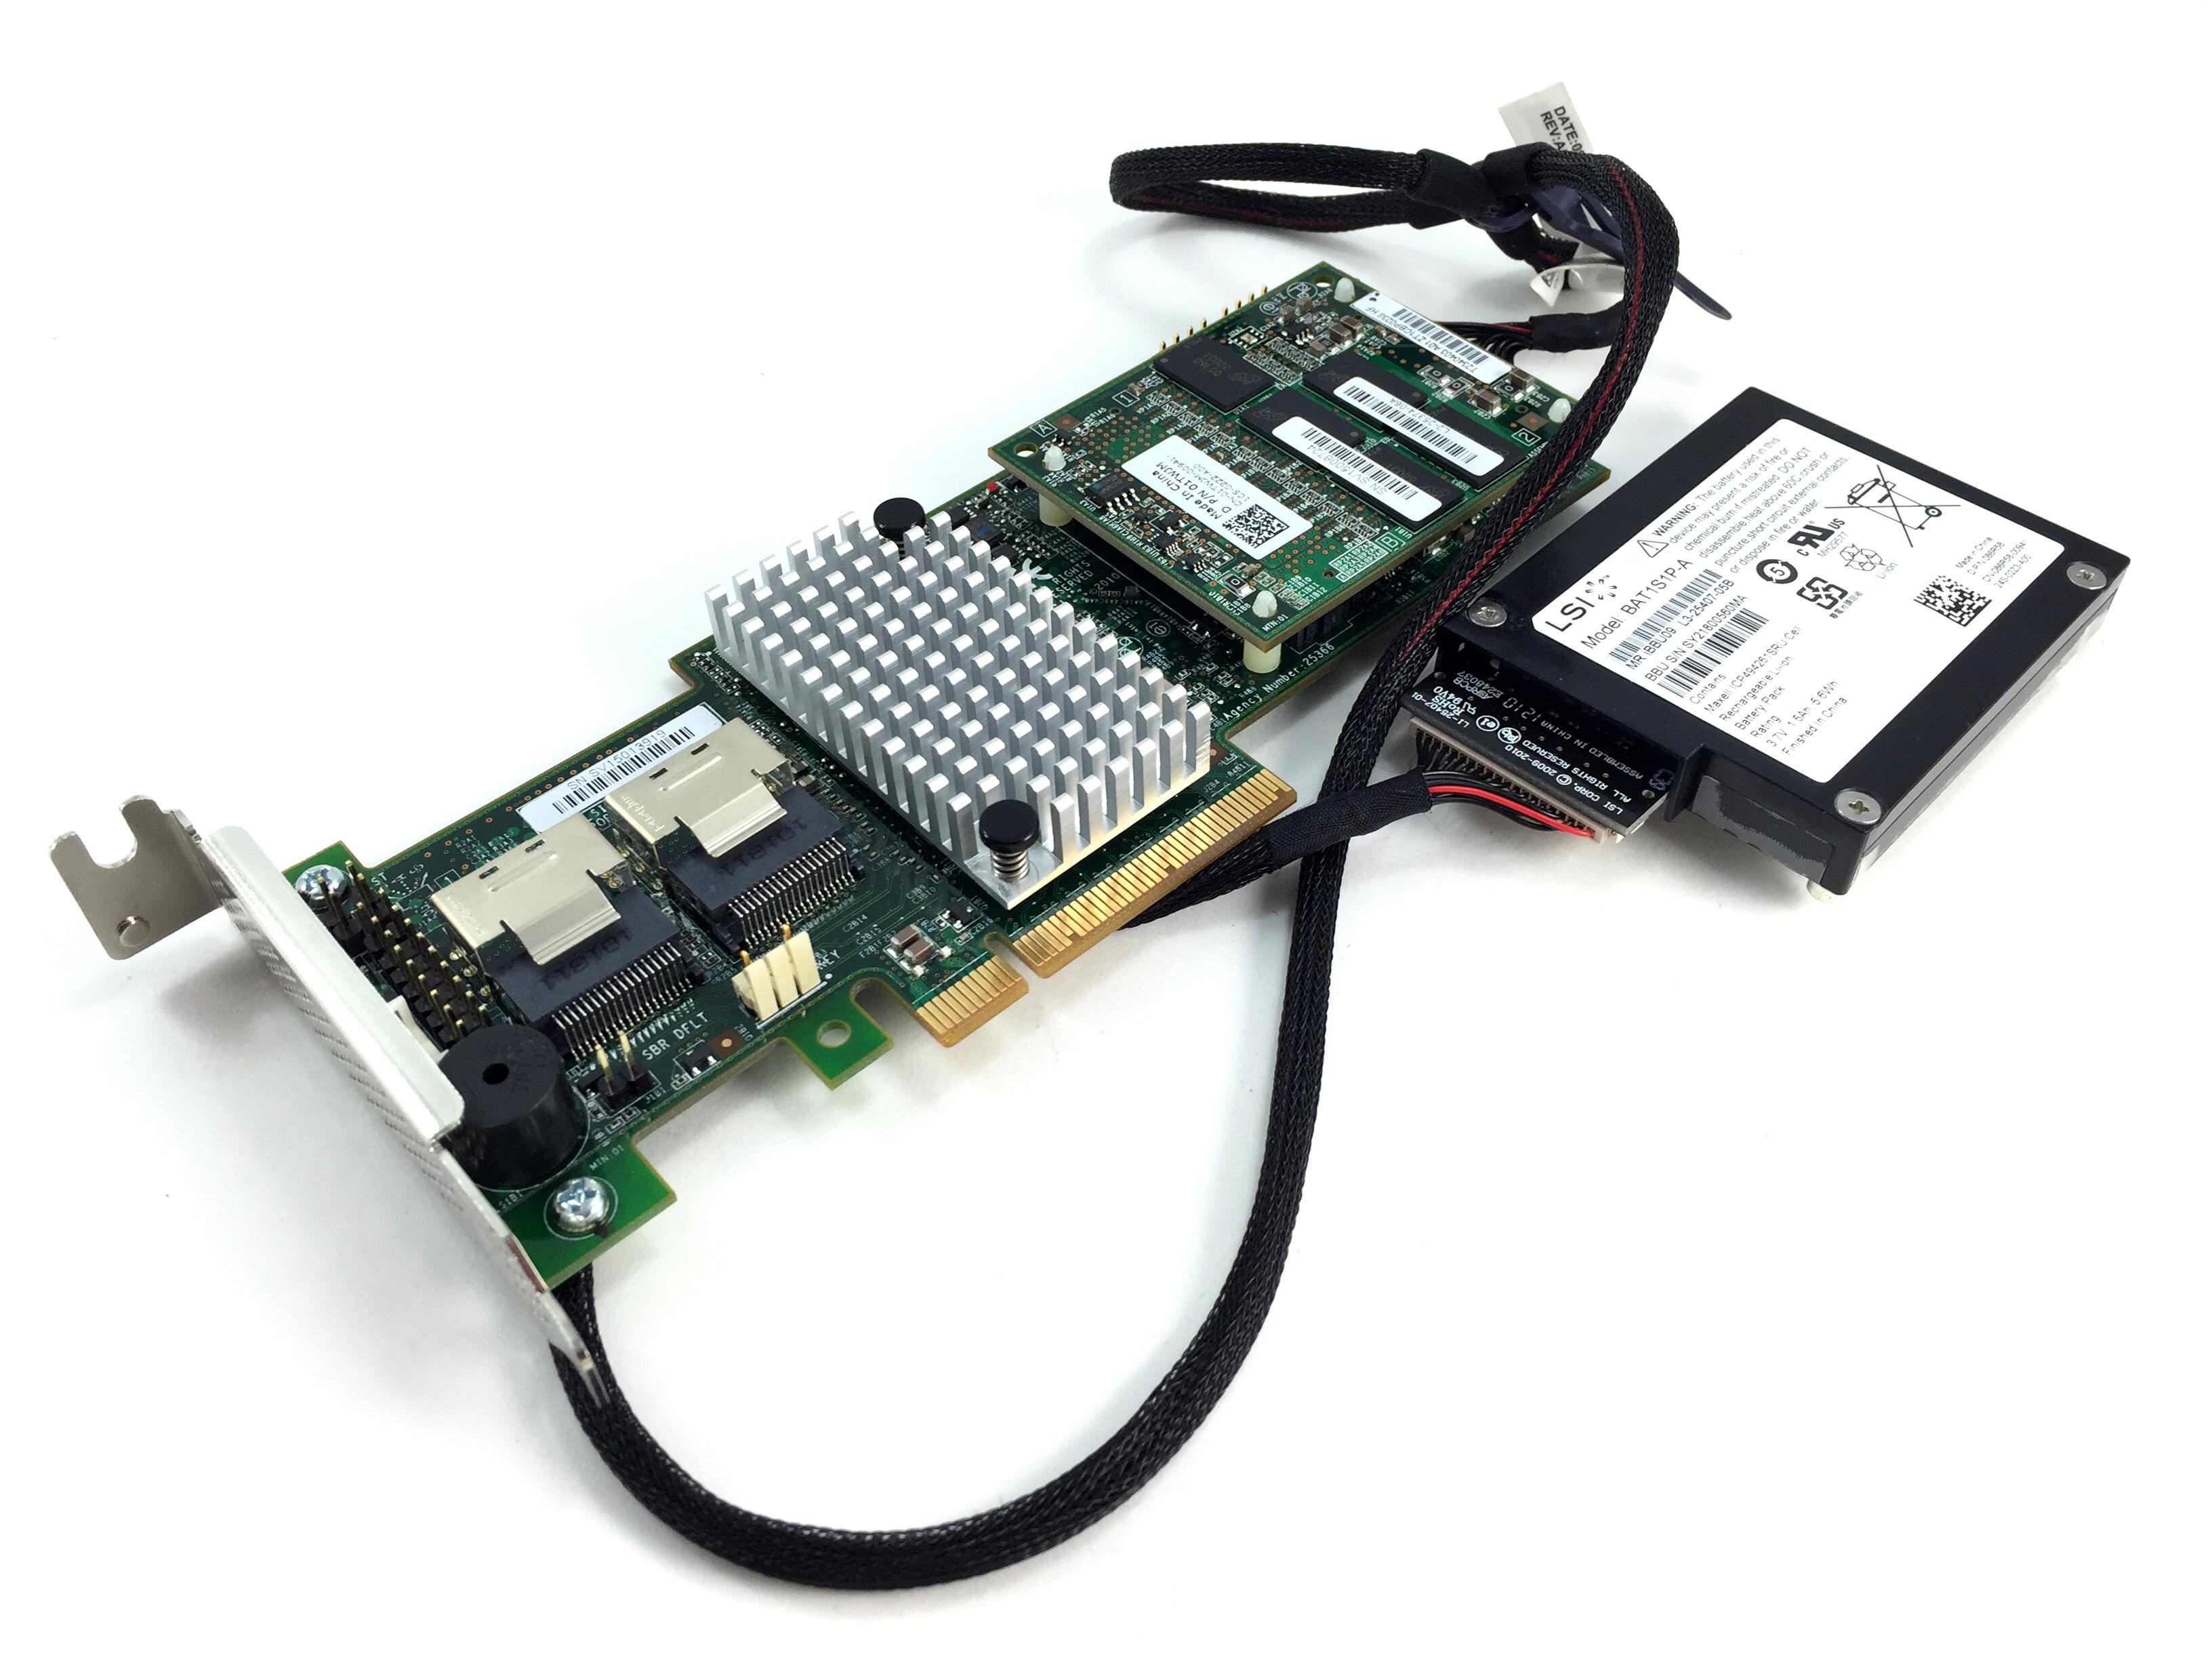 Details about 9265-8I LSI MegaRaid 6Gbps SAS/SATA 1GB Raid Controller w/  Battery Low Profile